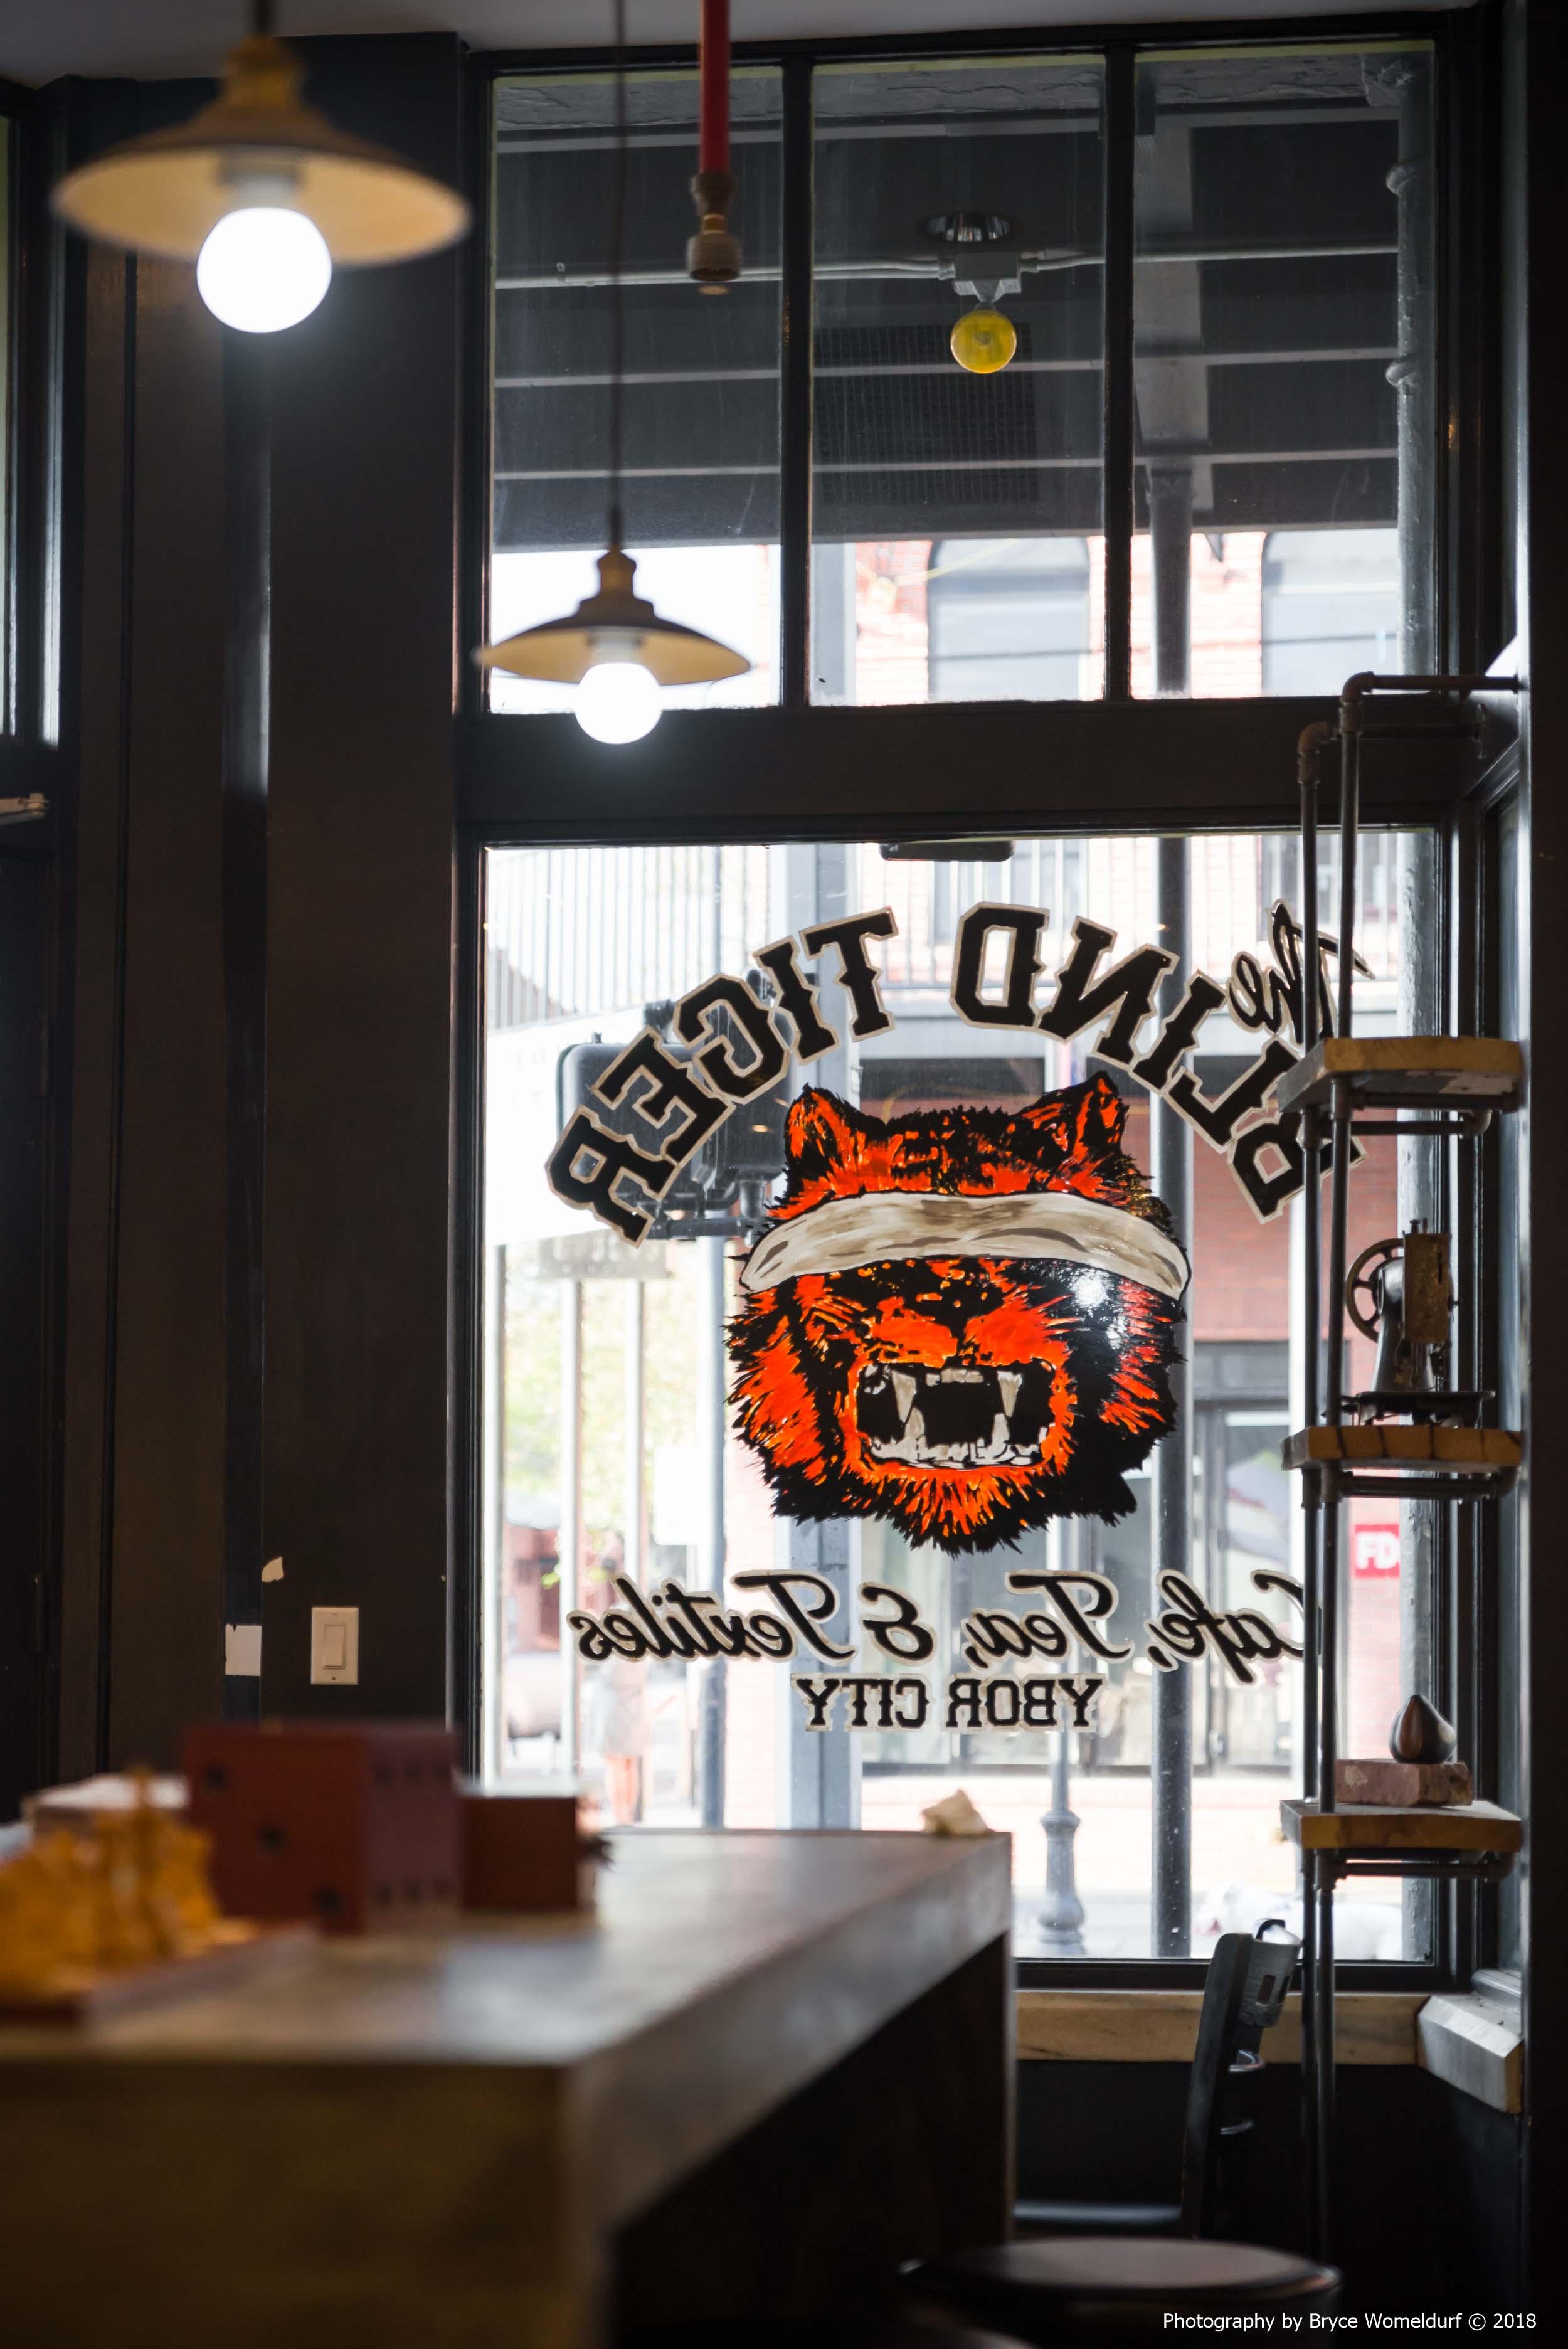 Blind Tiger coffee shop window | Ybor City, Florida